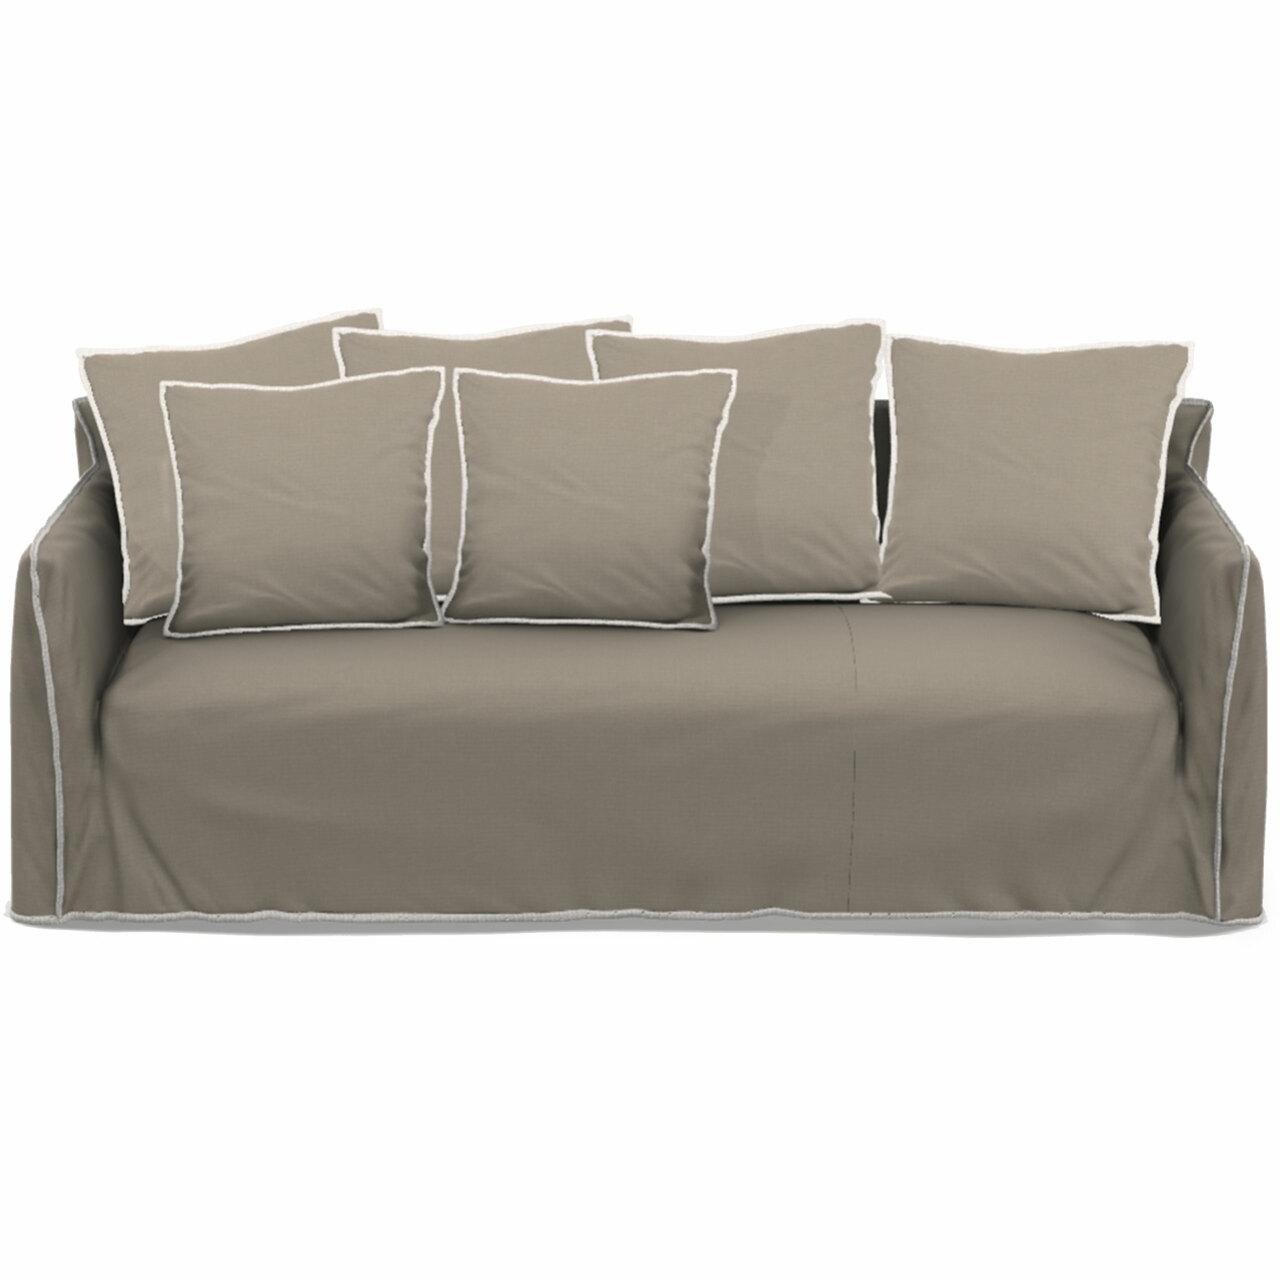 Gervasoni Sofa 'Ghost' B: 260 cm / T: 100 cm , Cenere - Furby